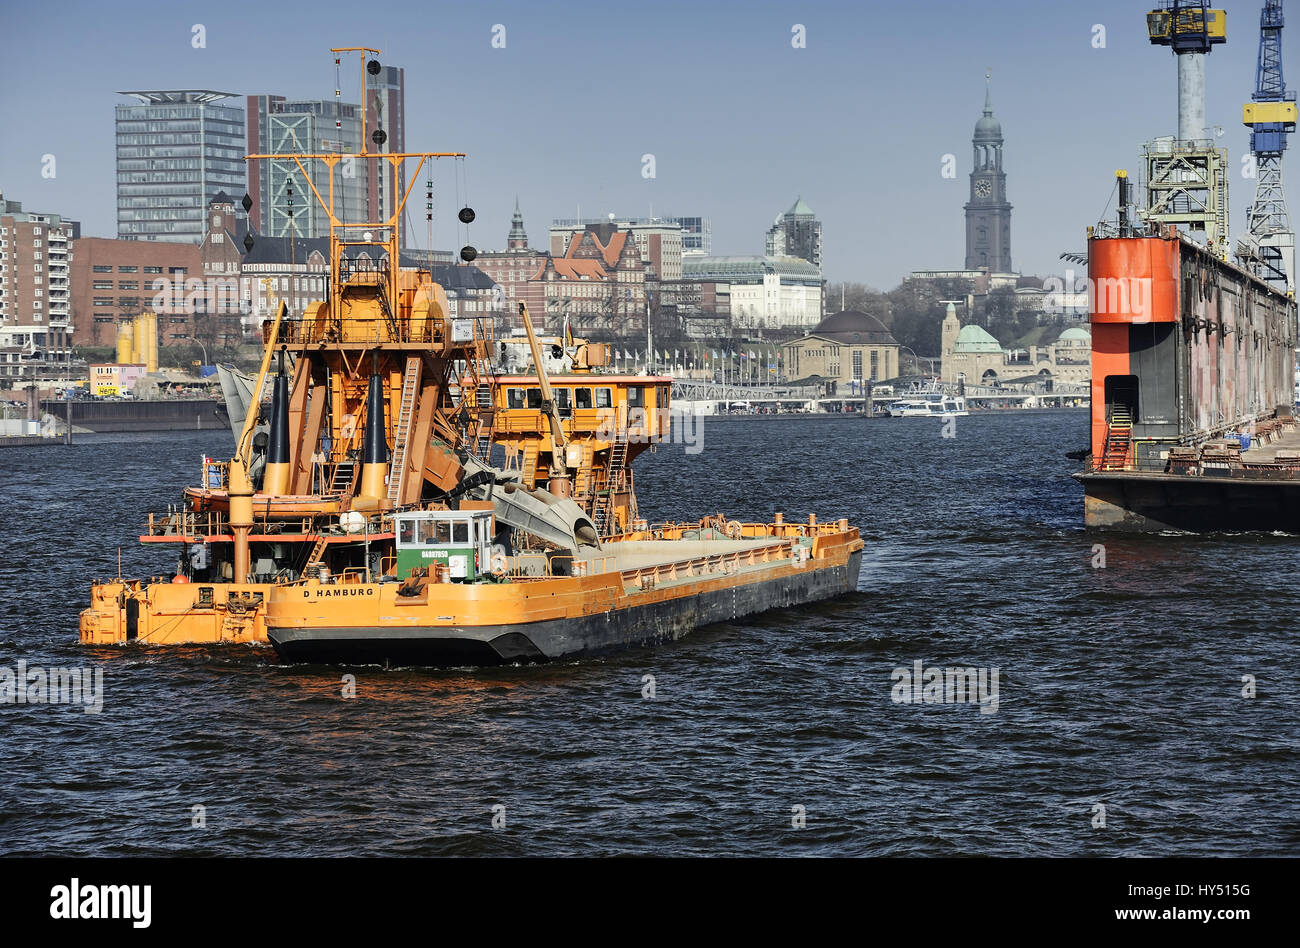 Elbvertiefung: Elbbagger Odin in the Hamburg harbour